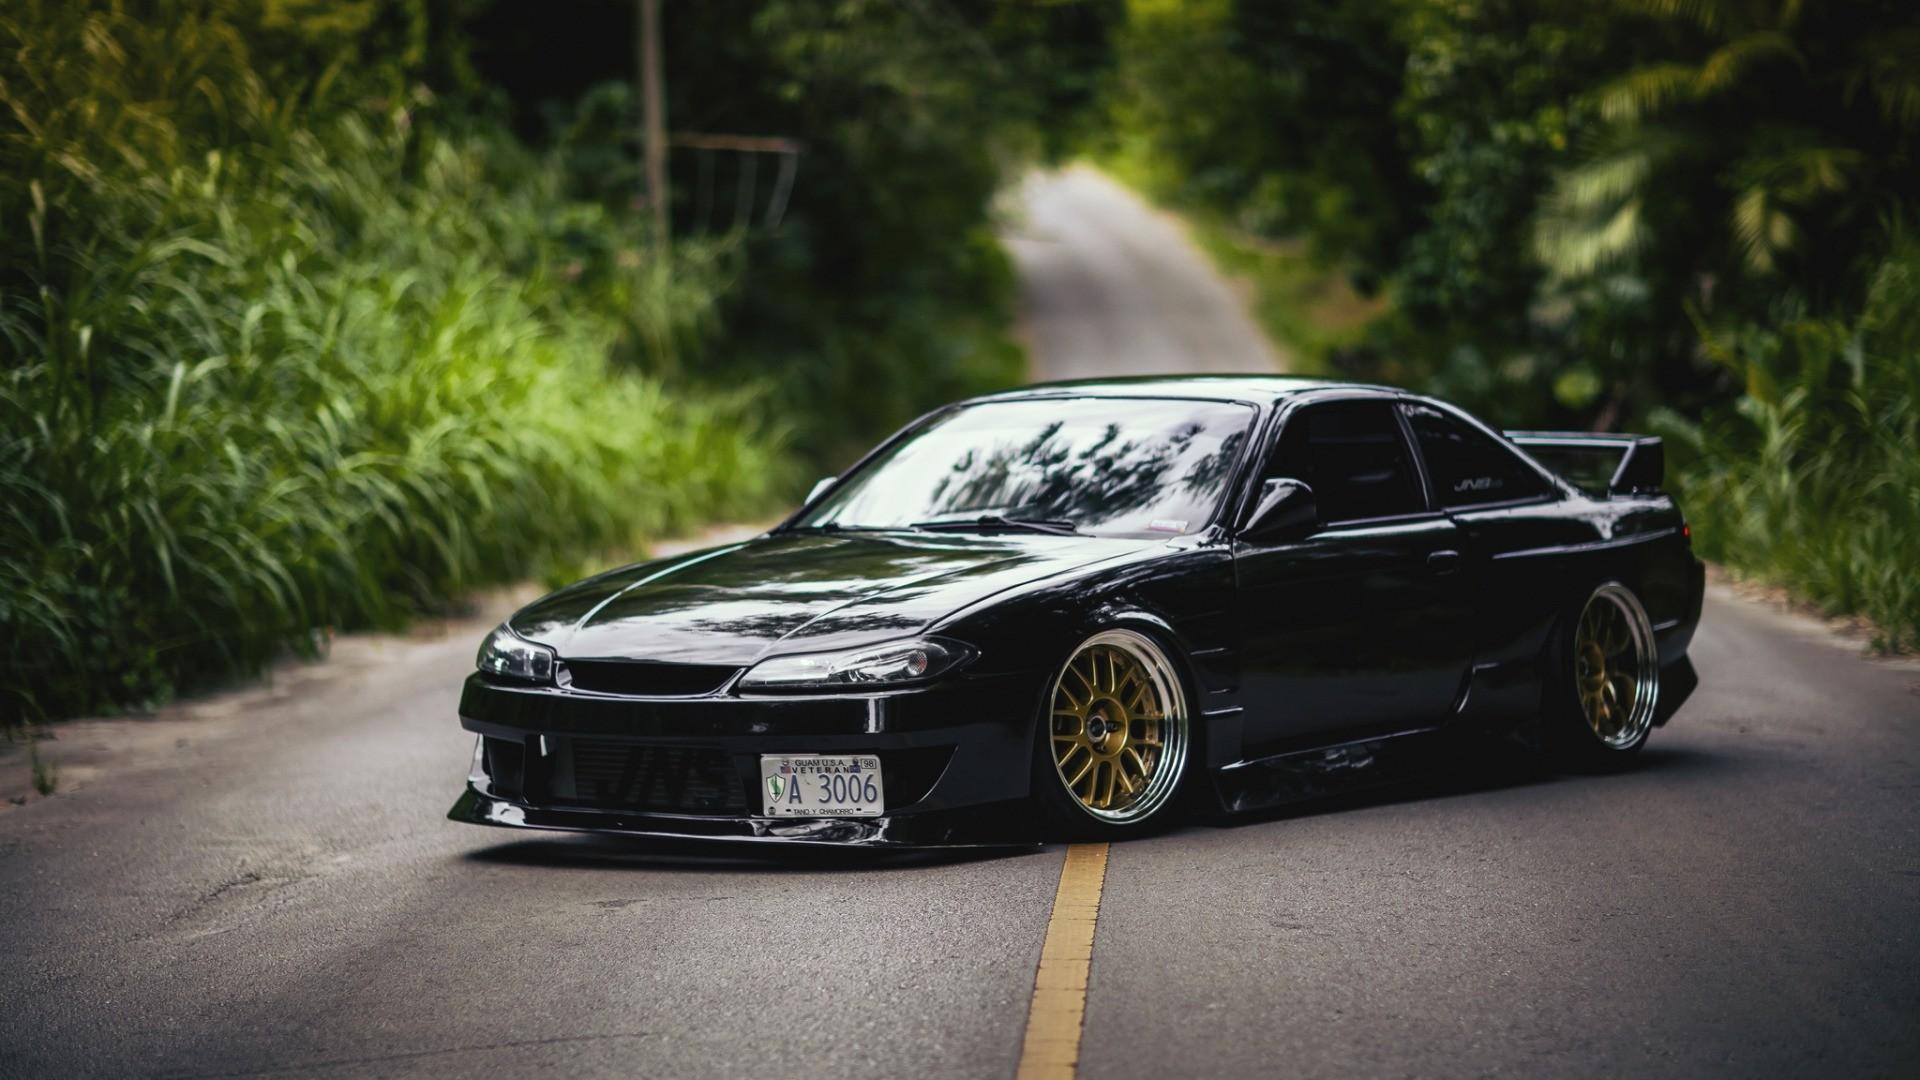 Jdm Nissan Silvia S15 1920x1080 Wallpaper Teahub Io